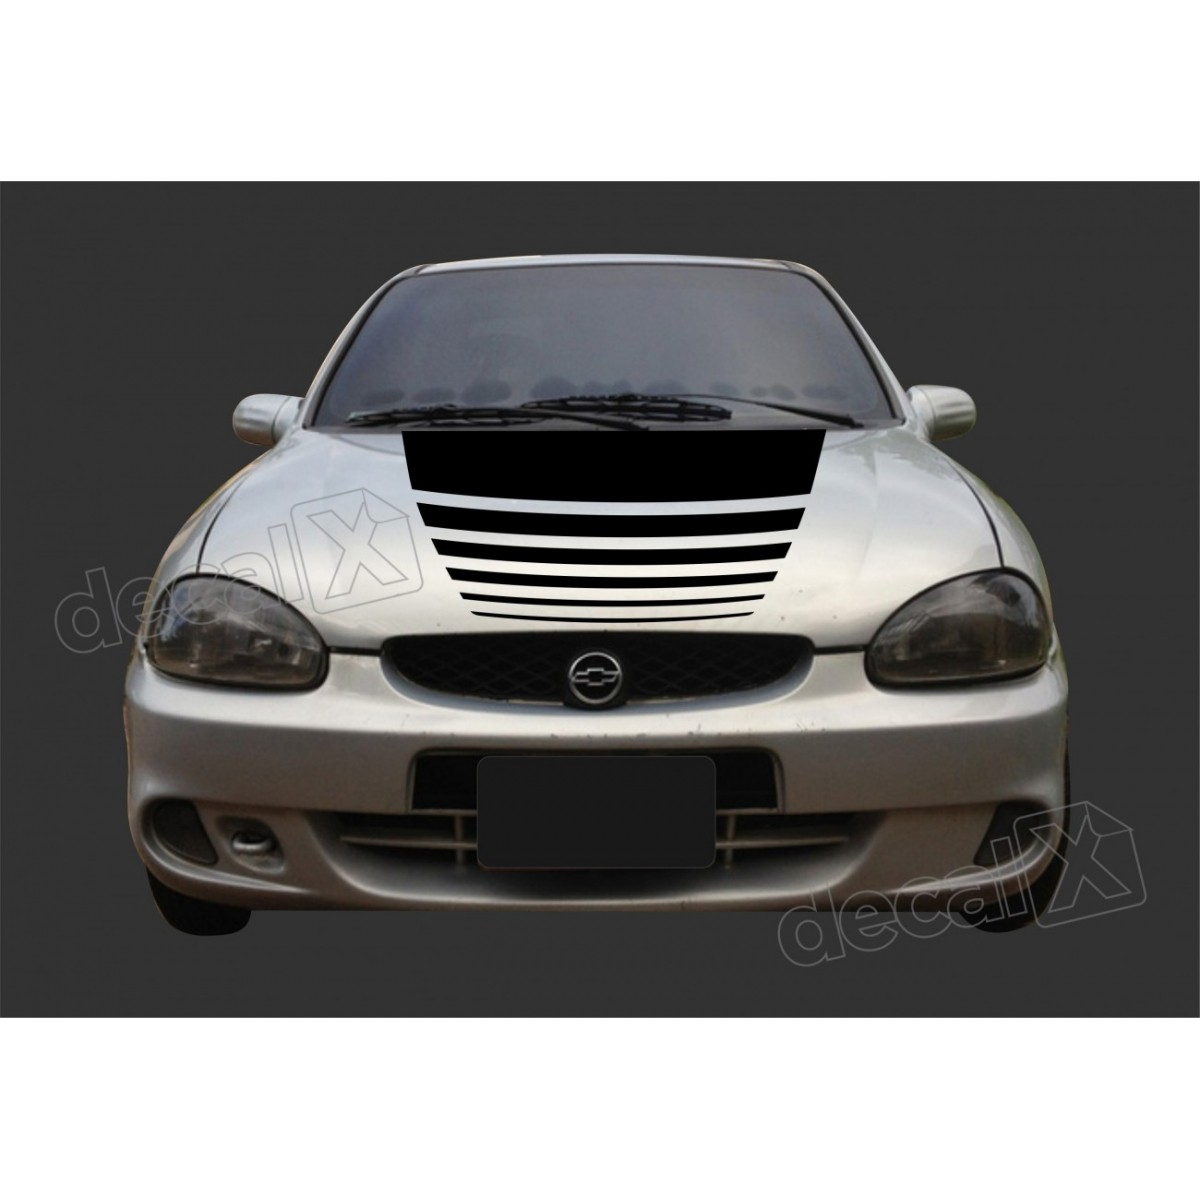 Kit Adesivos Capo Chevrolet Corsa 3m Ctm513